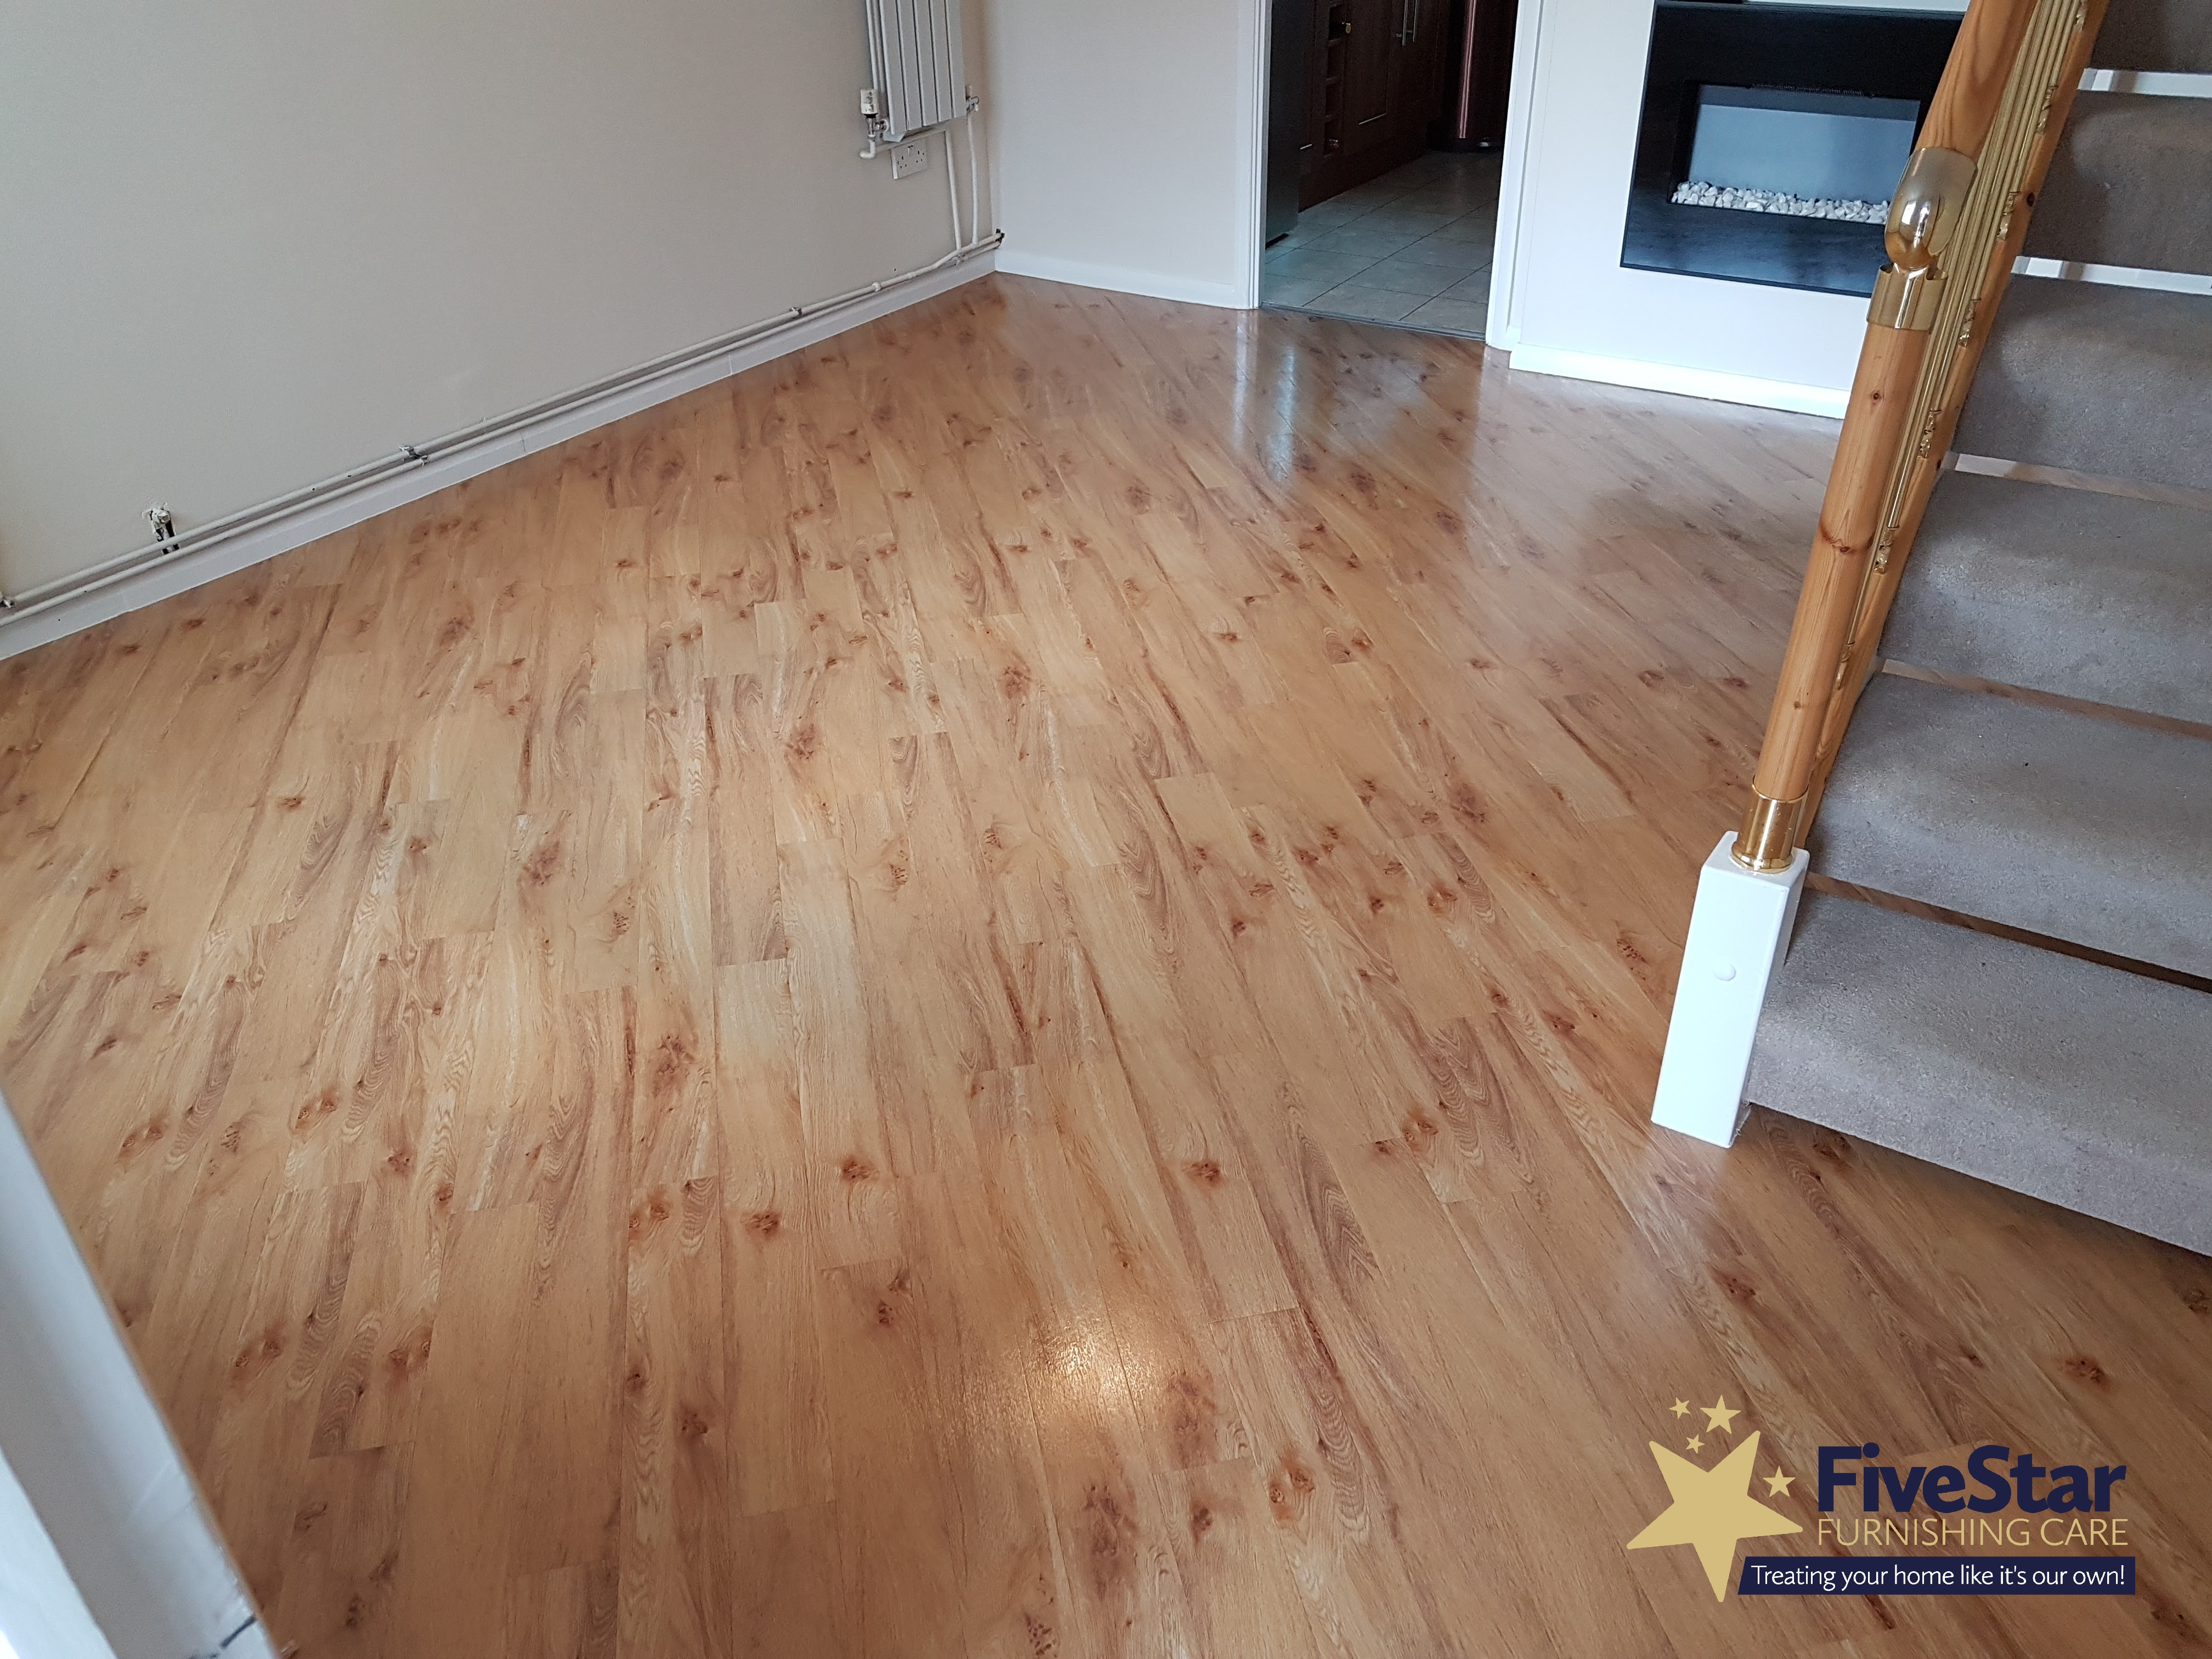 wakefield luxury tiles flooring design floorstore karndean vinyl leeds floor